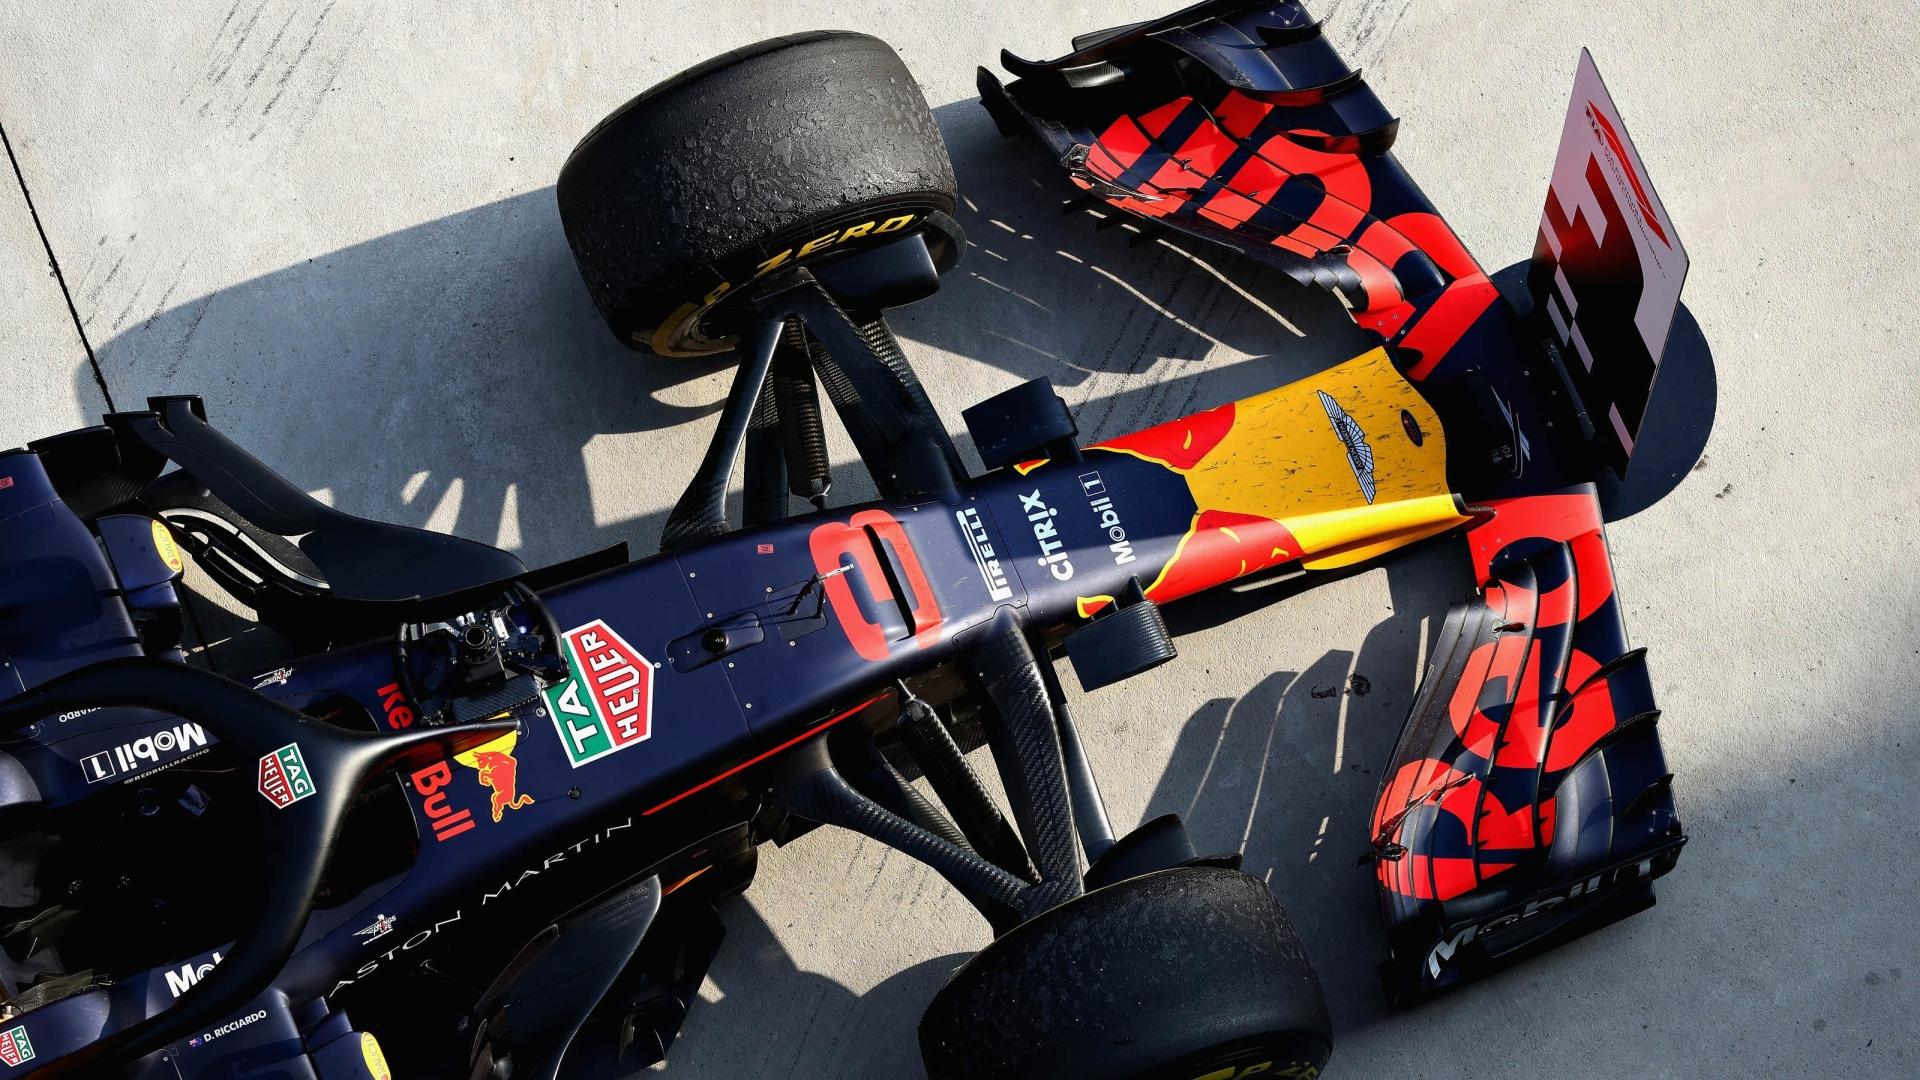 La Red Bull de Daniel Ricciardo après sa victoire au GP de Chine